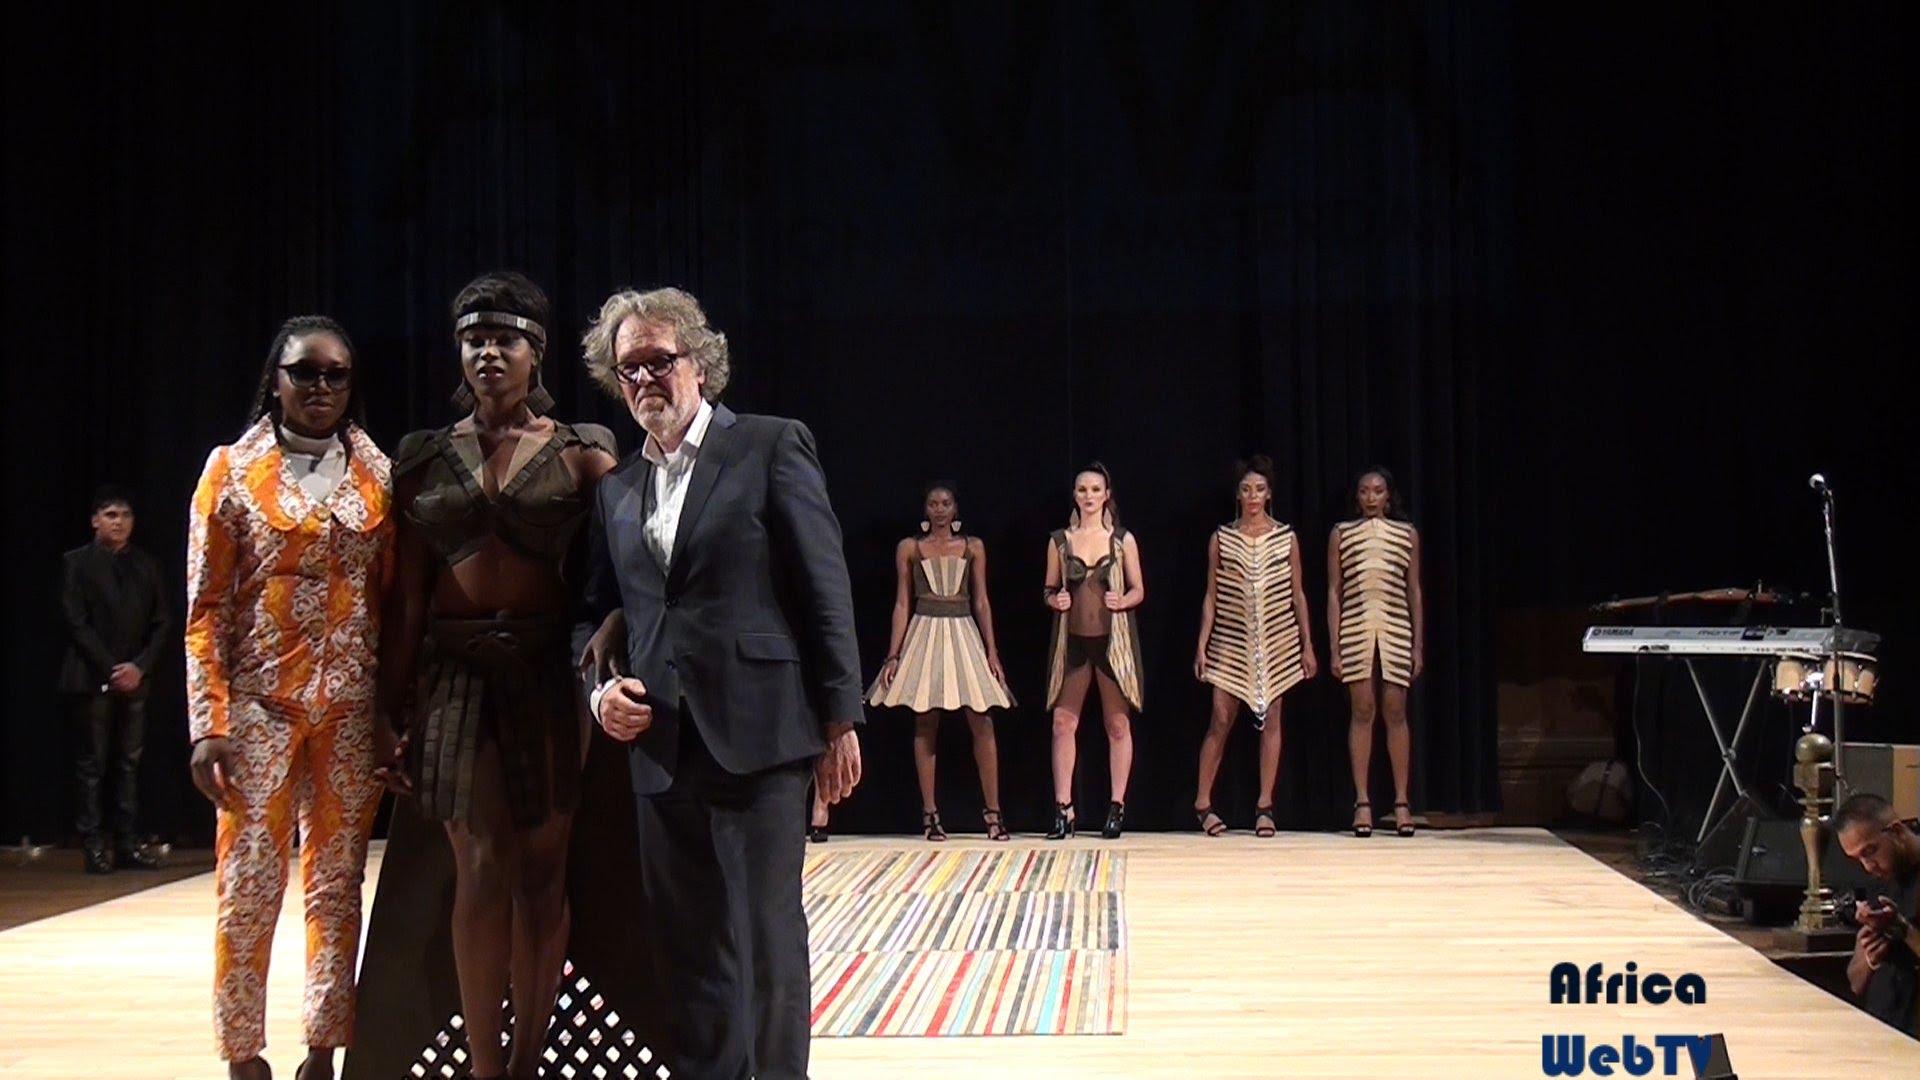 Africa Fashion Week Amsterdam 2015 Day 1 Highlights